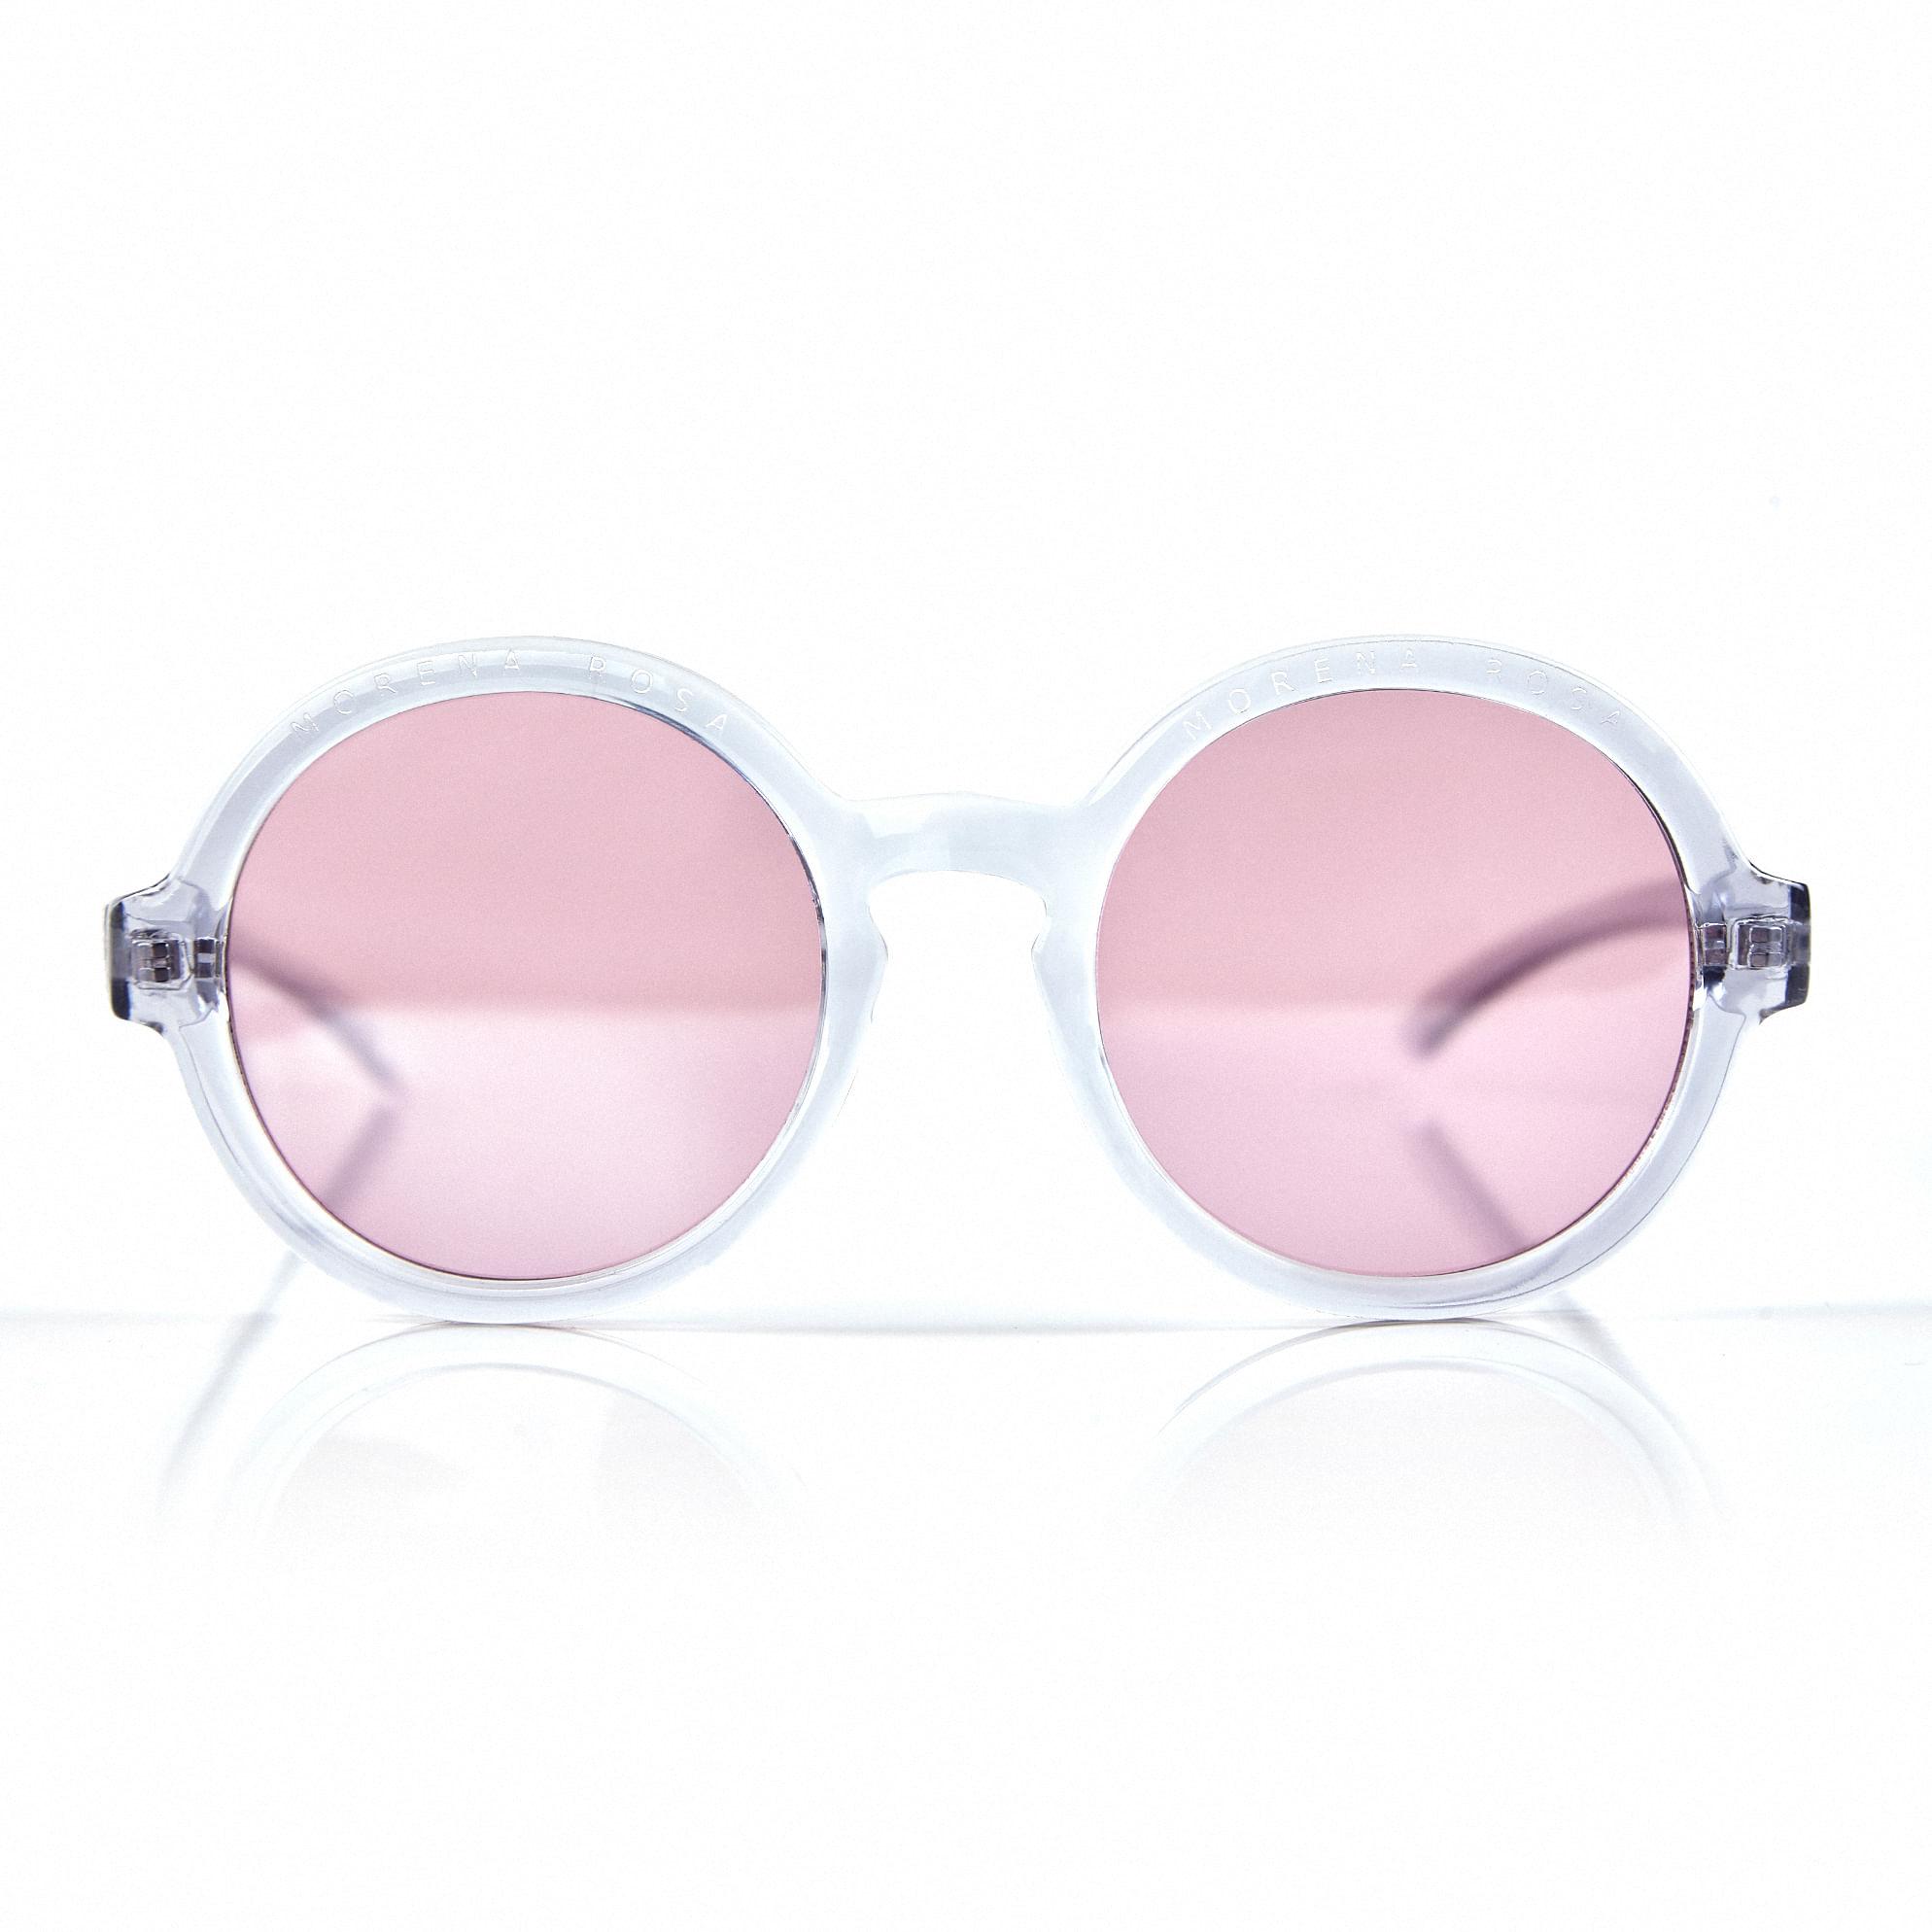 8b6b764077acd Oculos Redondo Cristal Com Gravacao Morena Rosa Borda Branco - TU